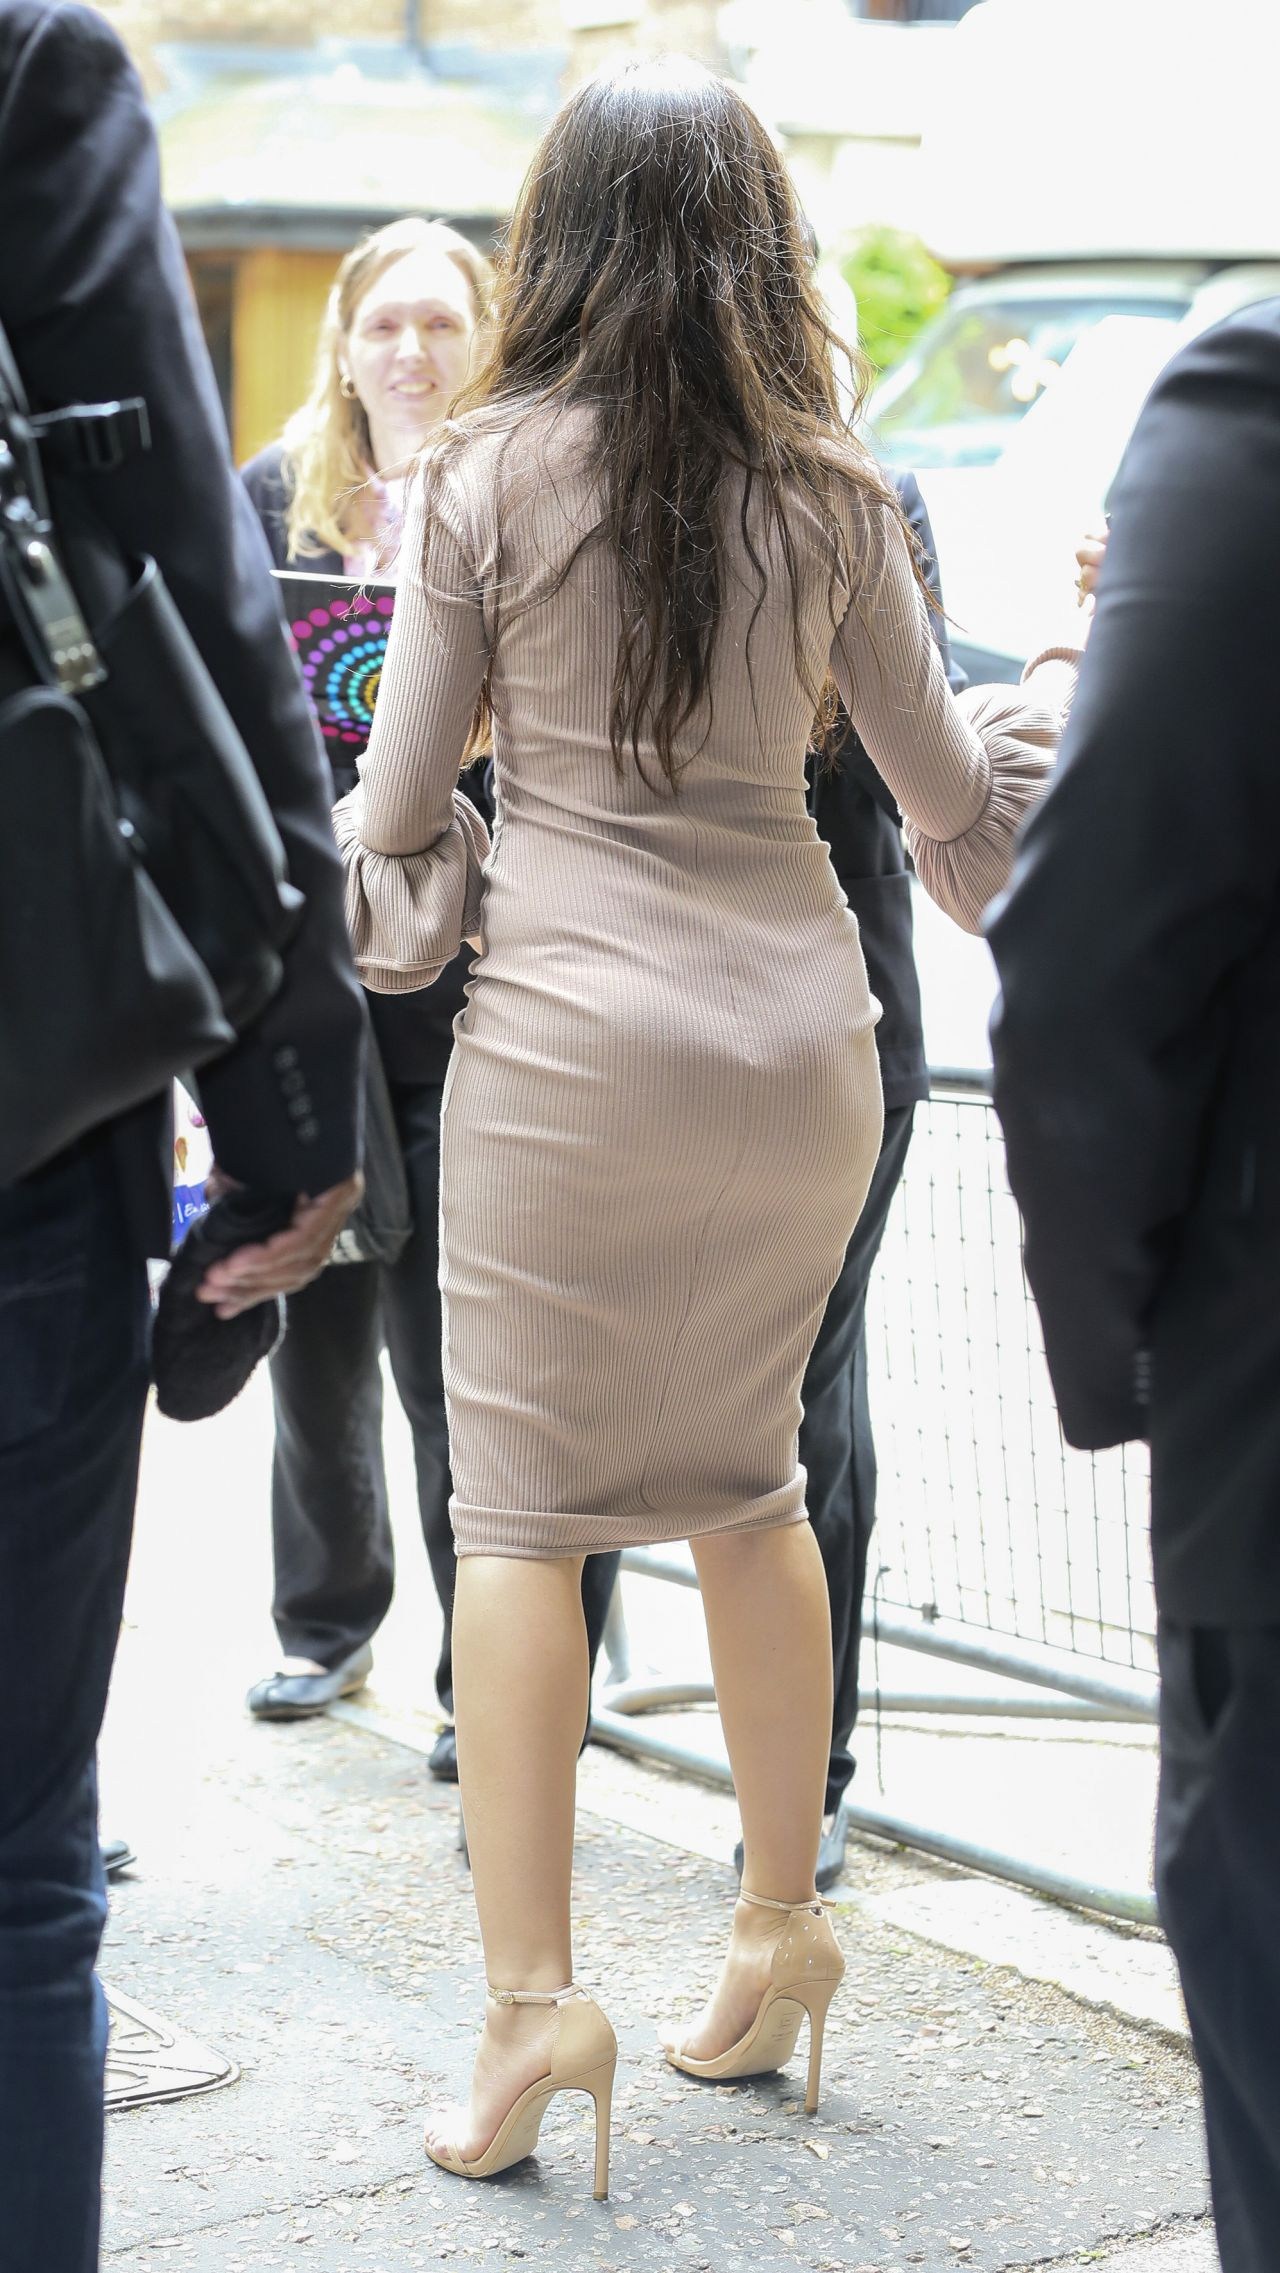 Camila Cabello at The ITV Studios in Central London UK 05